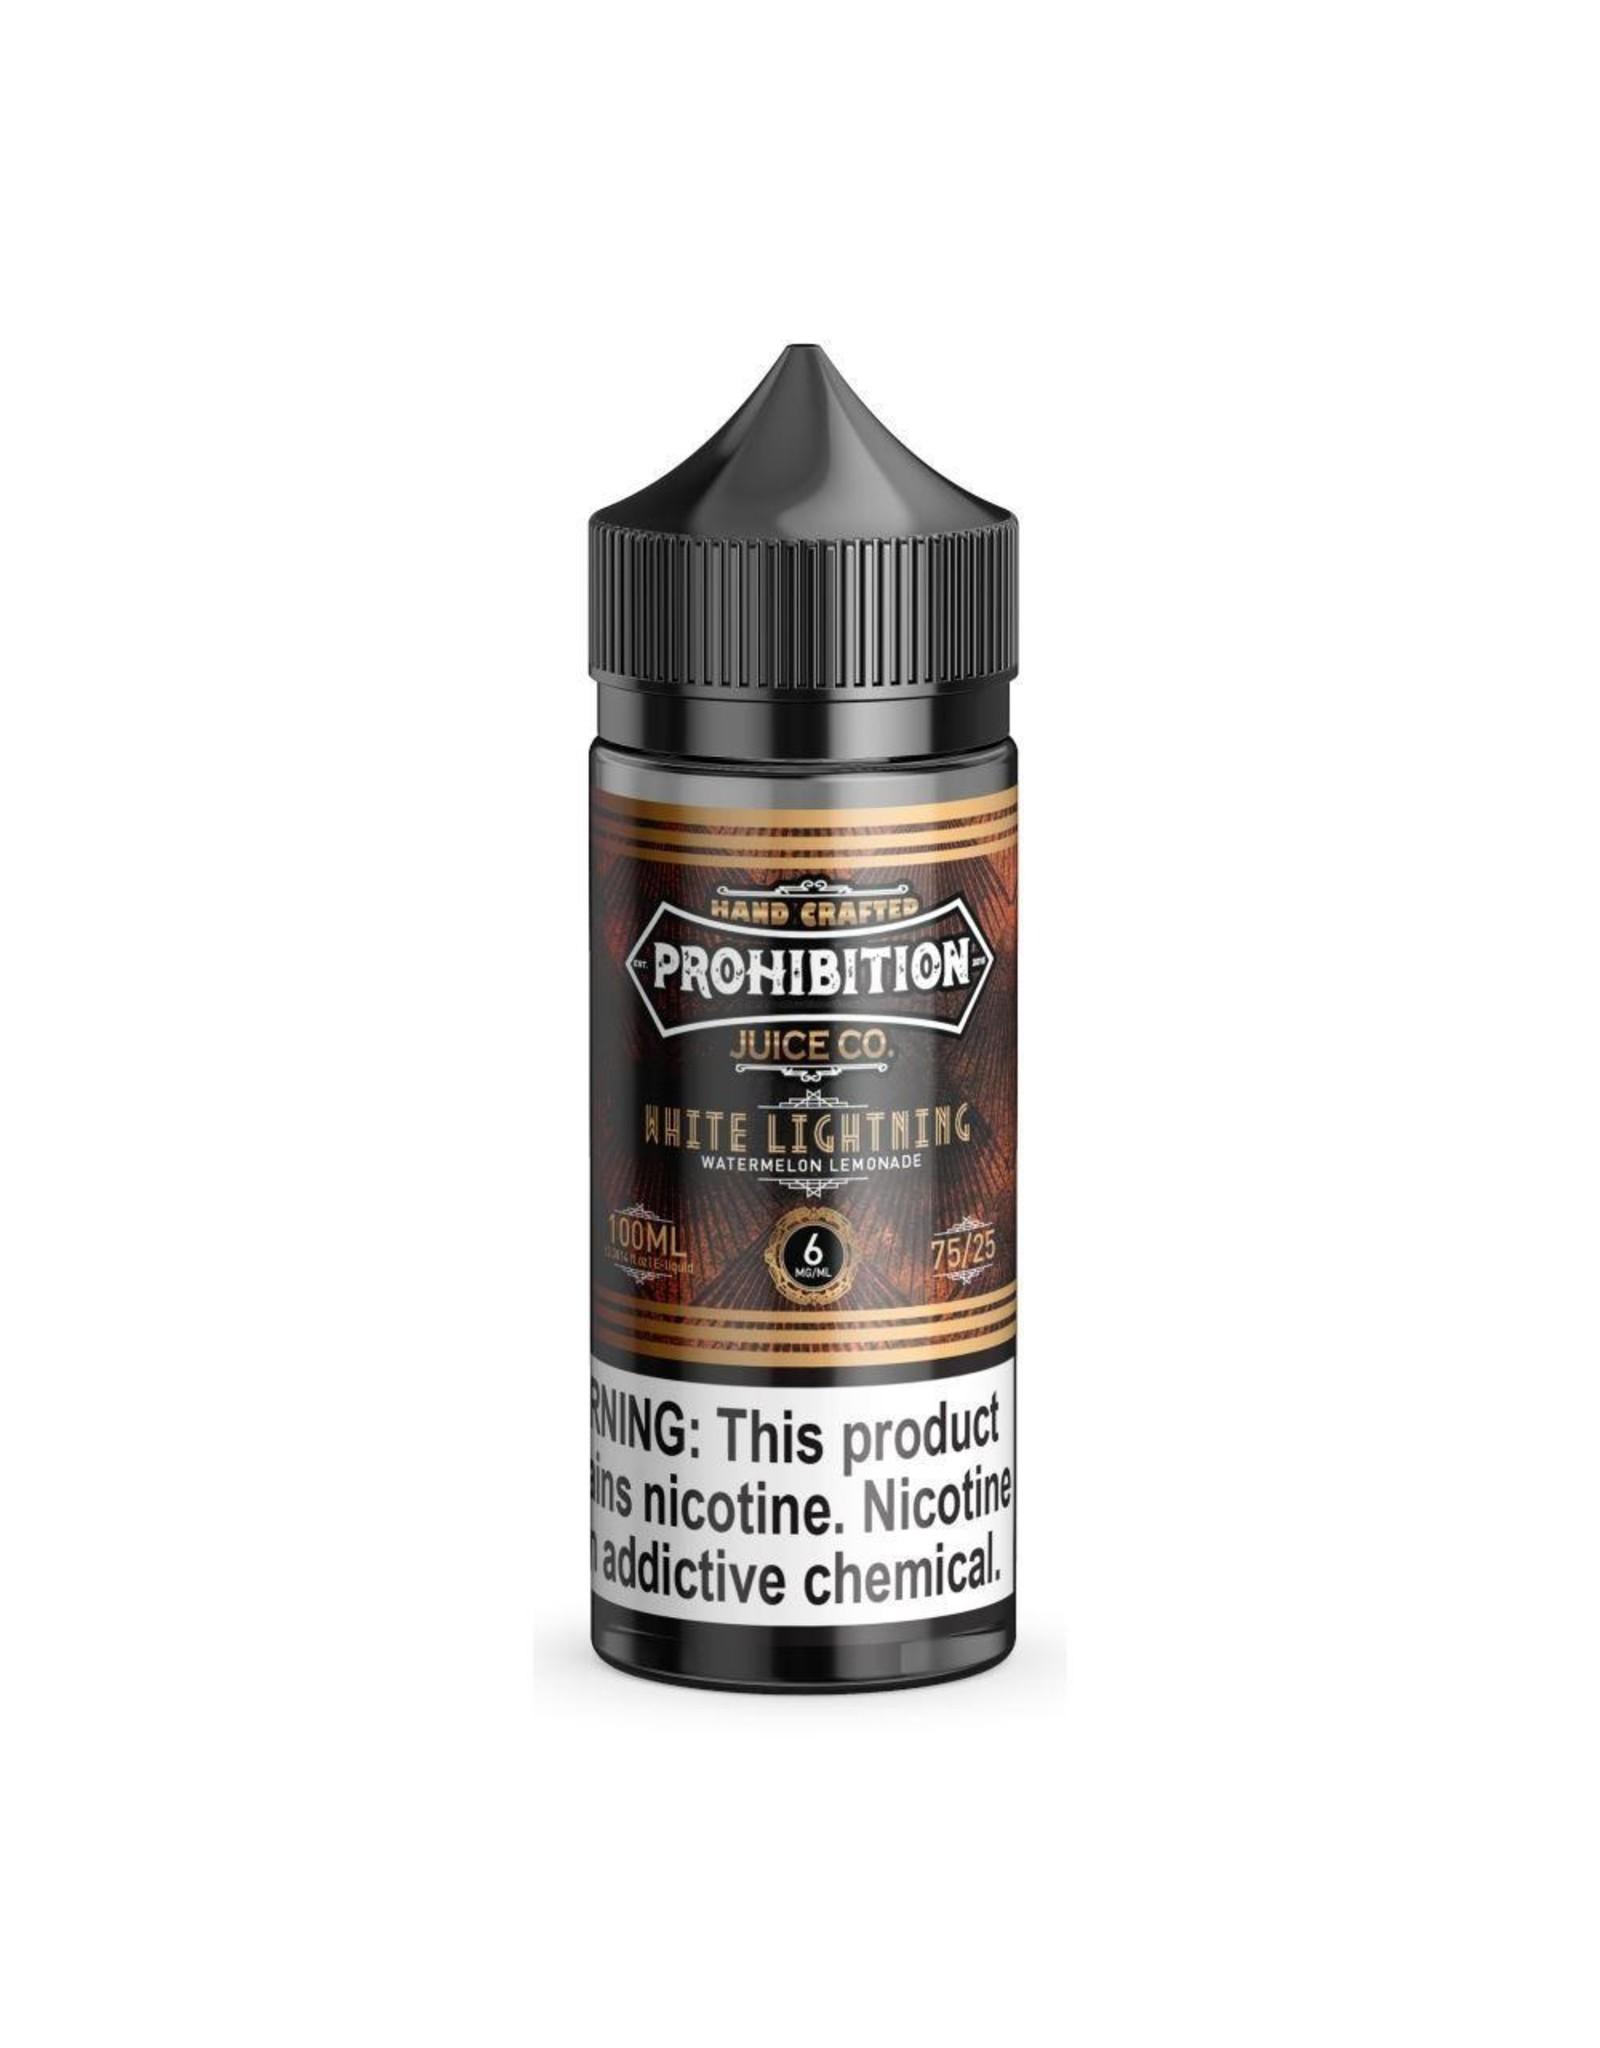 Prohibition Juice Co. White Lightning by Prohibition Juice Co.